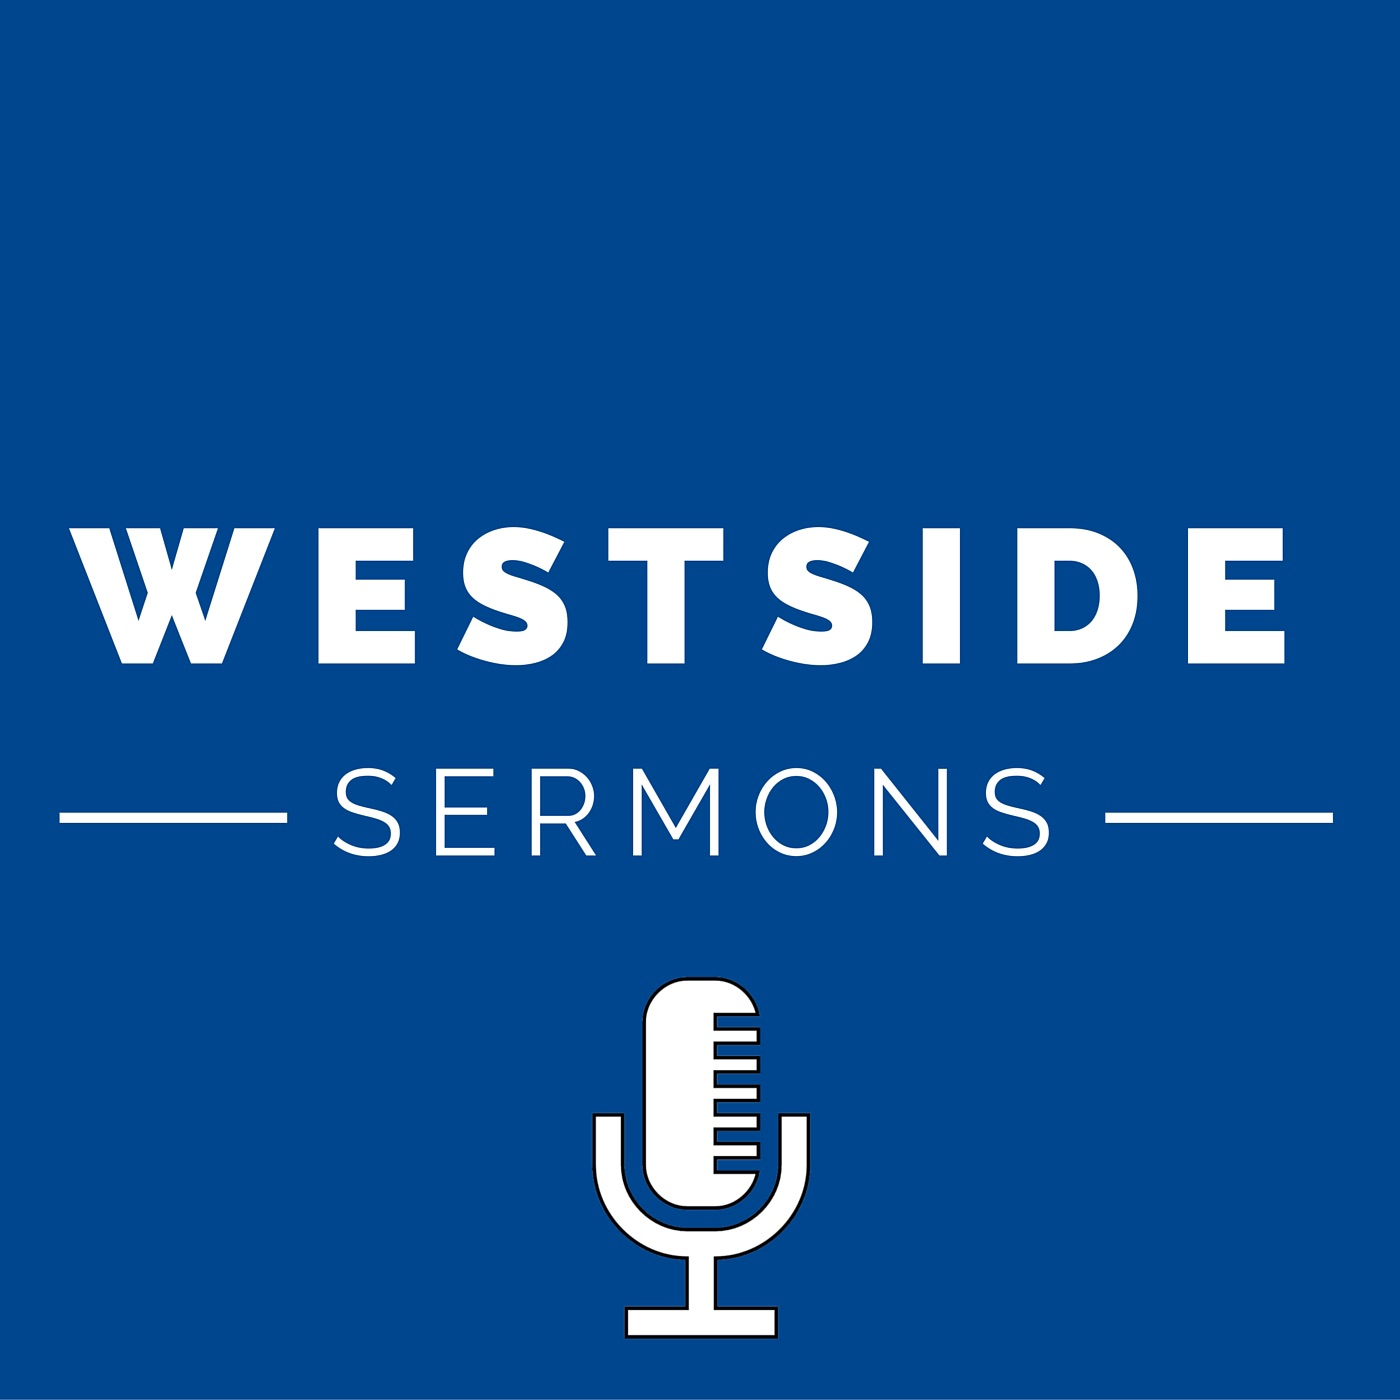 WestSide Lutheran Sermons